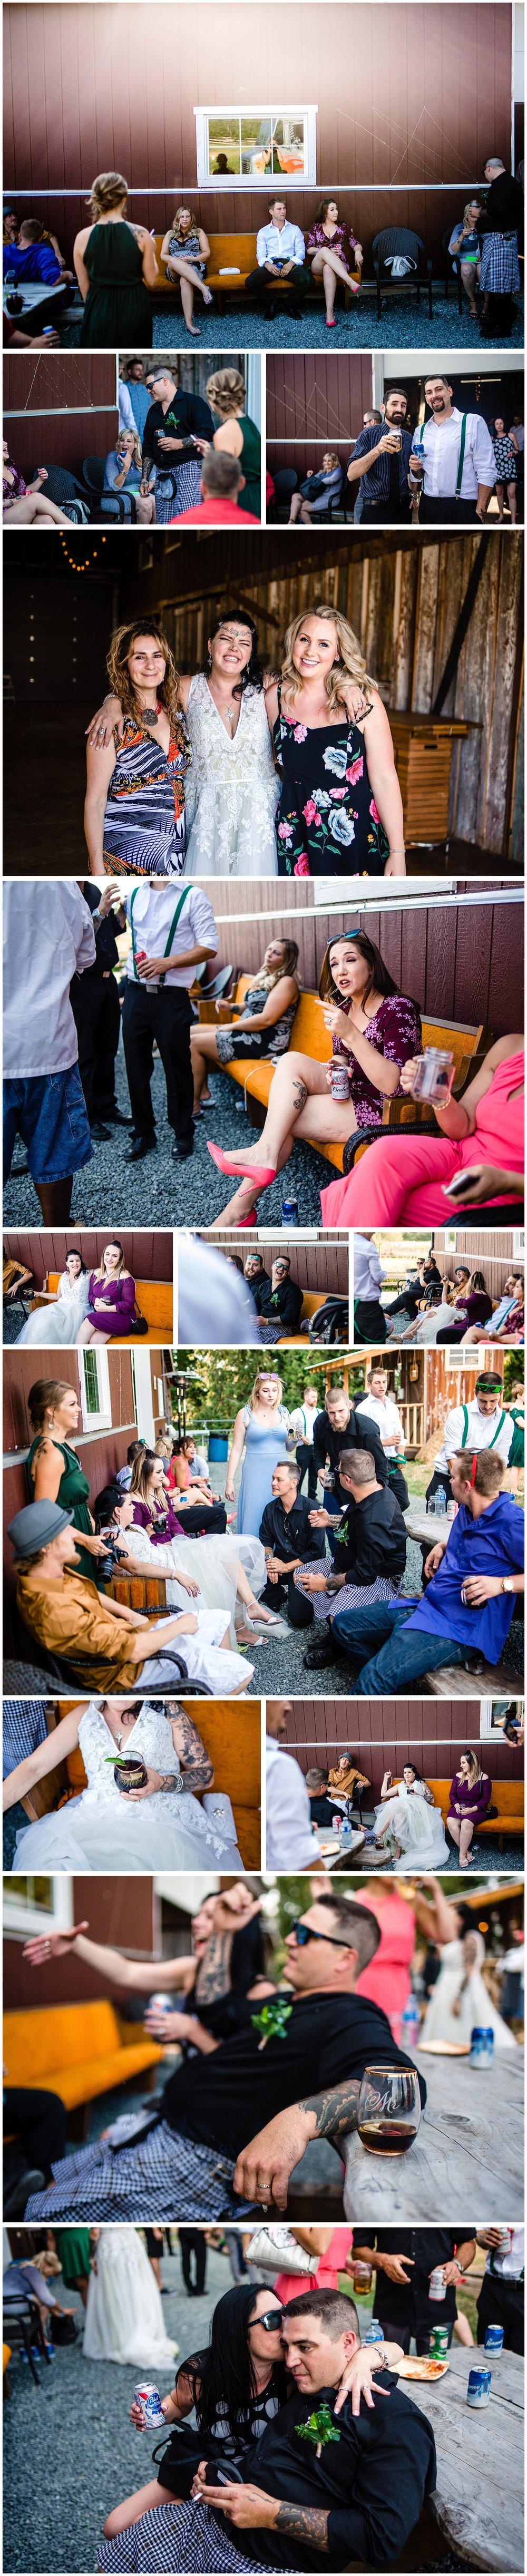 White-Owl-Barn-langley-bc-wedding-photographer-rustic-bbq-foodtruck-scottish-emerald-green-drinks_0006.jpg